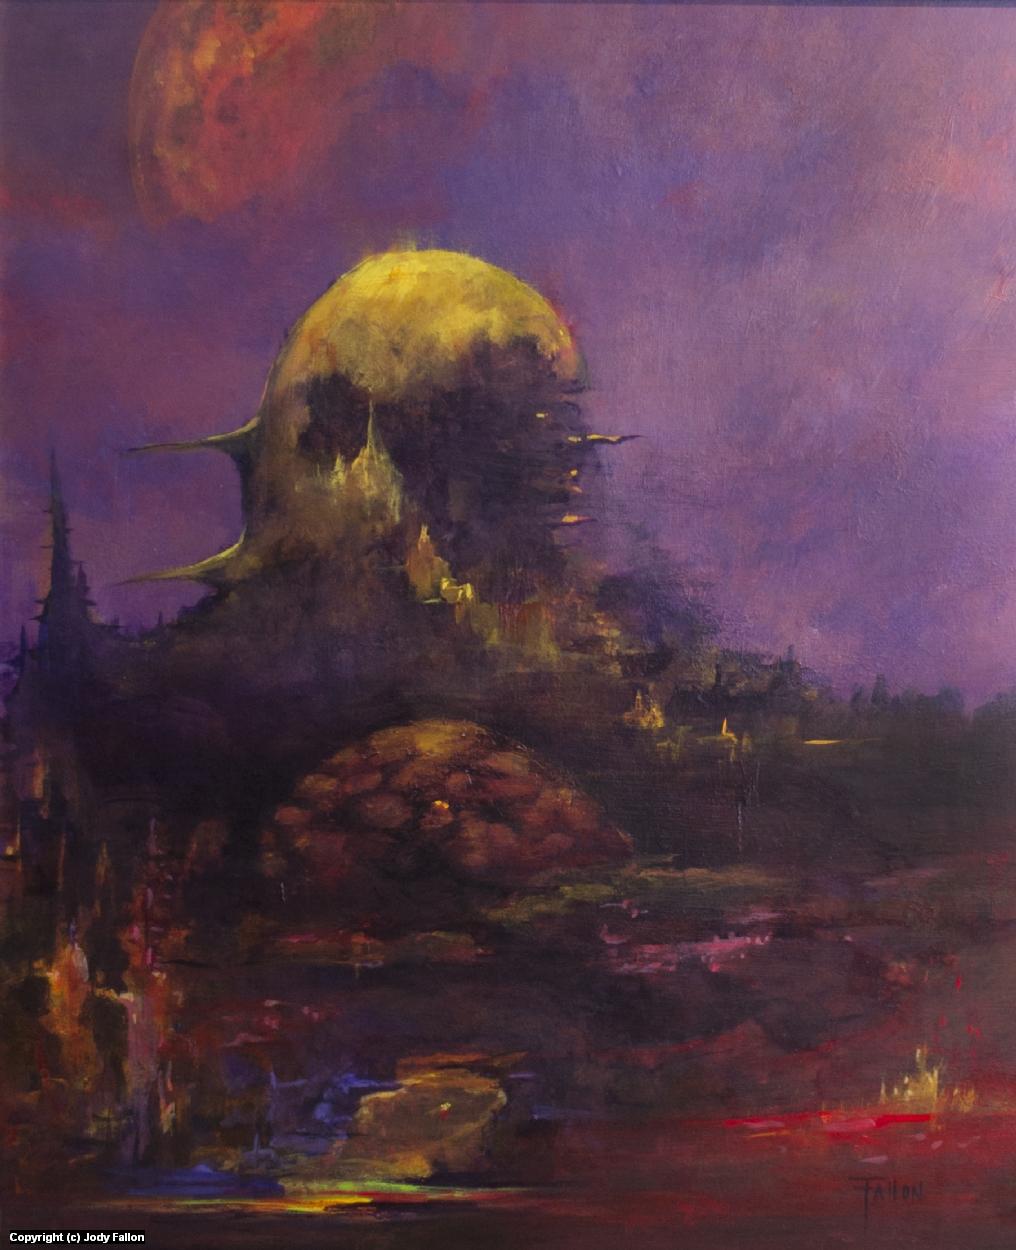 Deconstructing the Watcher Artwork by Jody Fallon